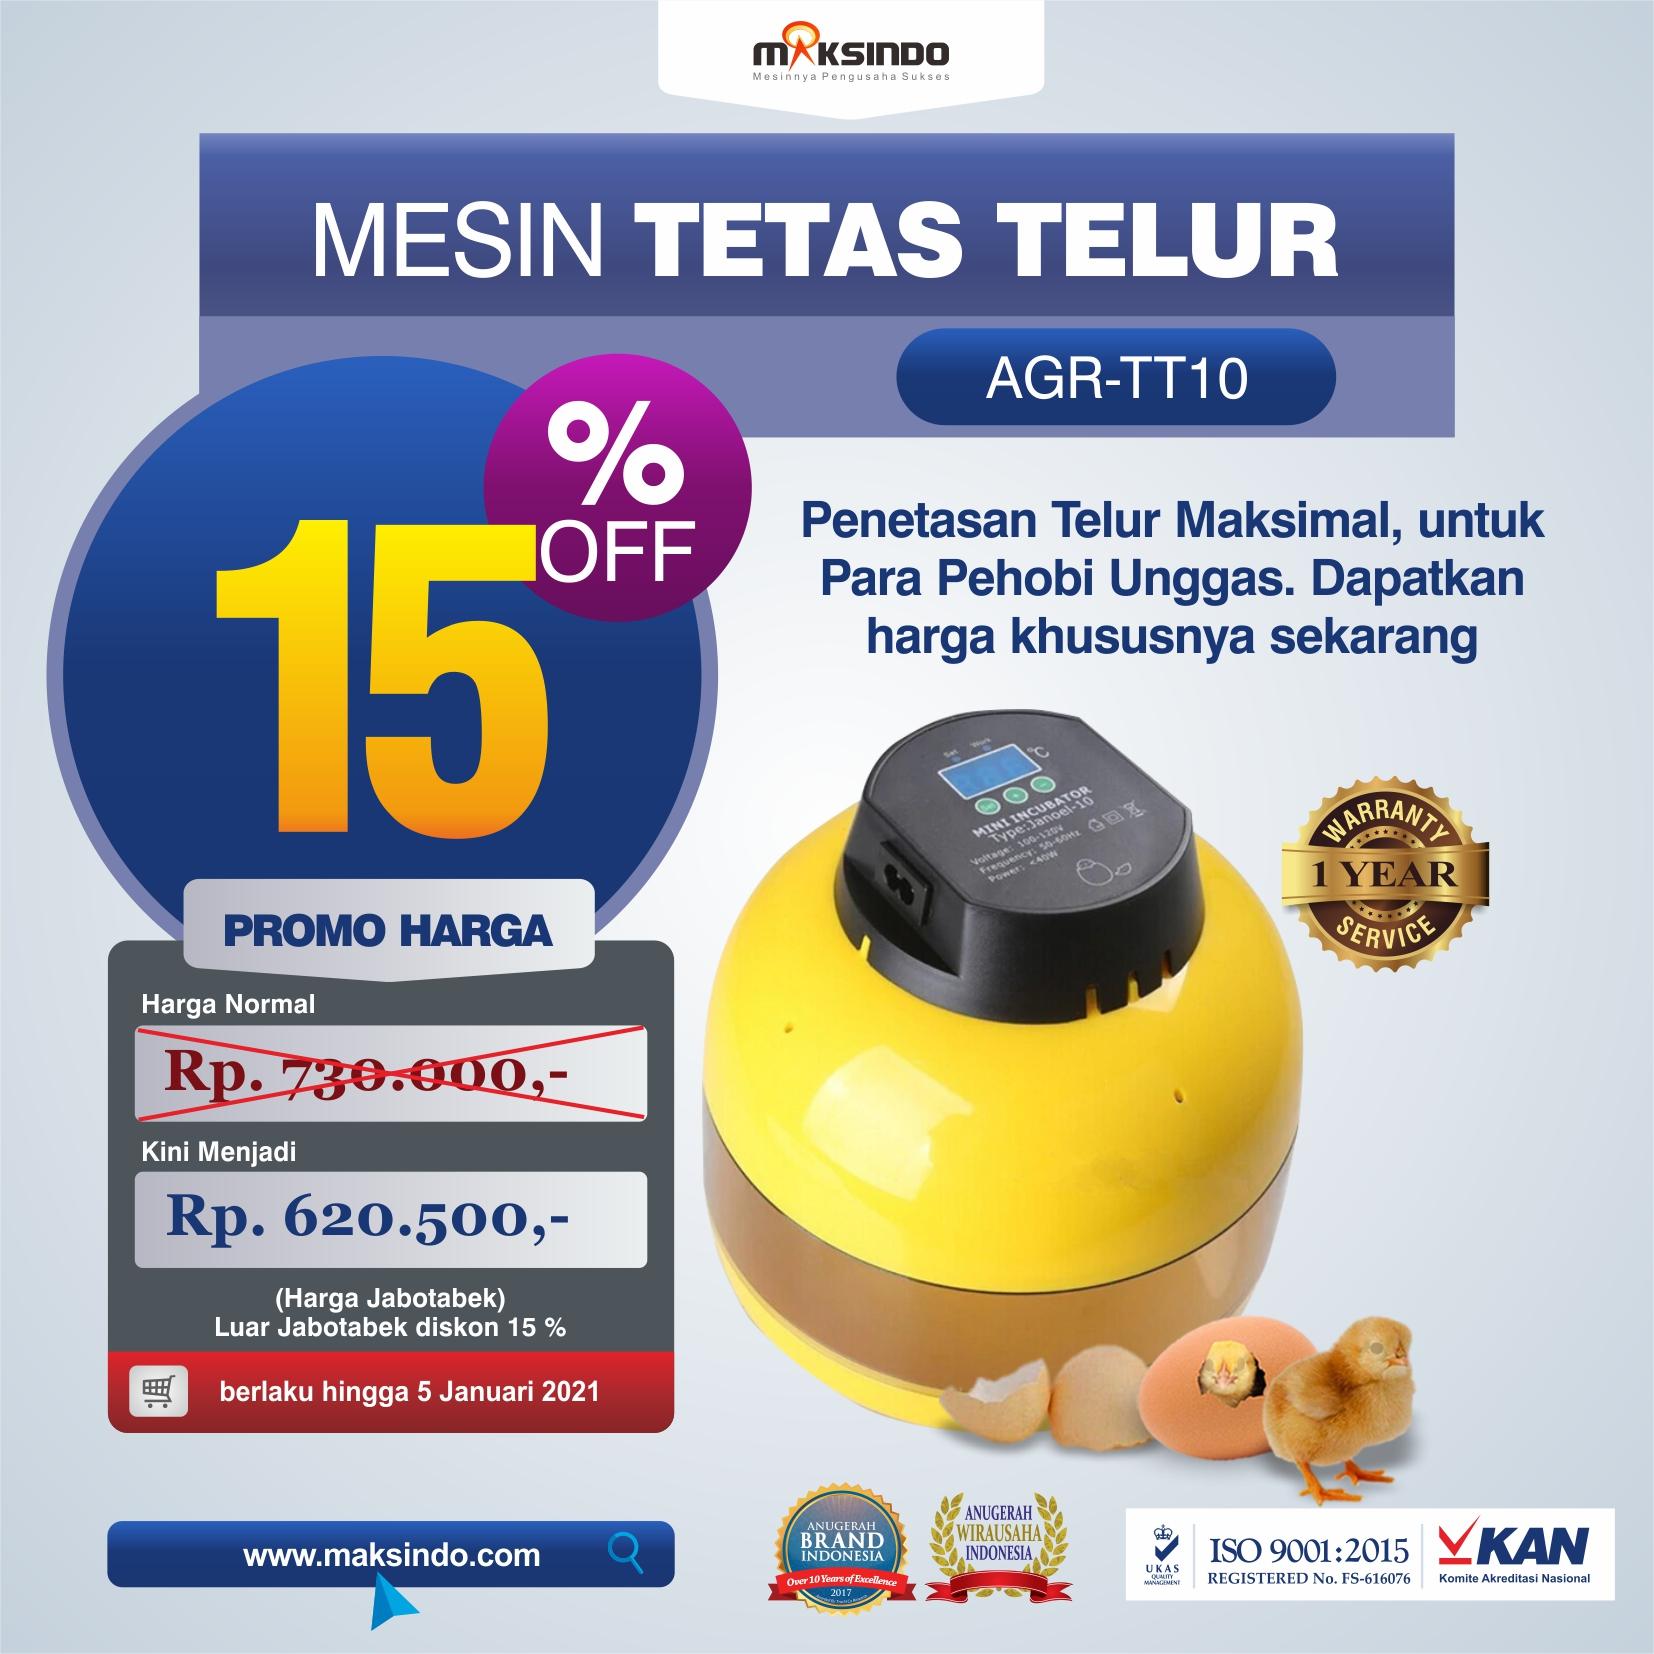 Jual Mesin Tetas Telur 10 Butir (AGR-TT-10) di Malang